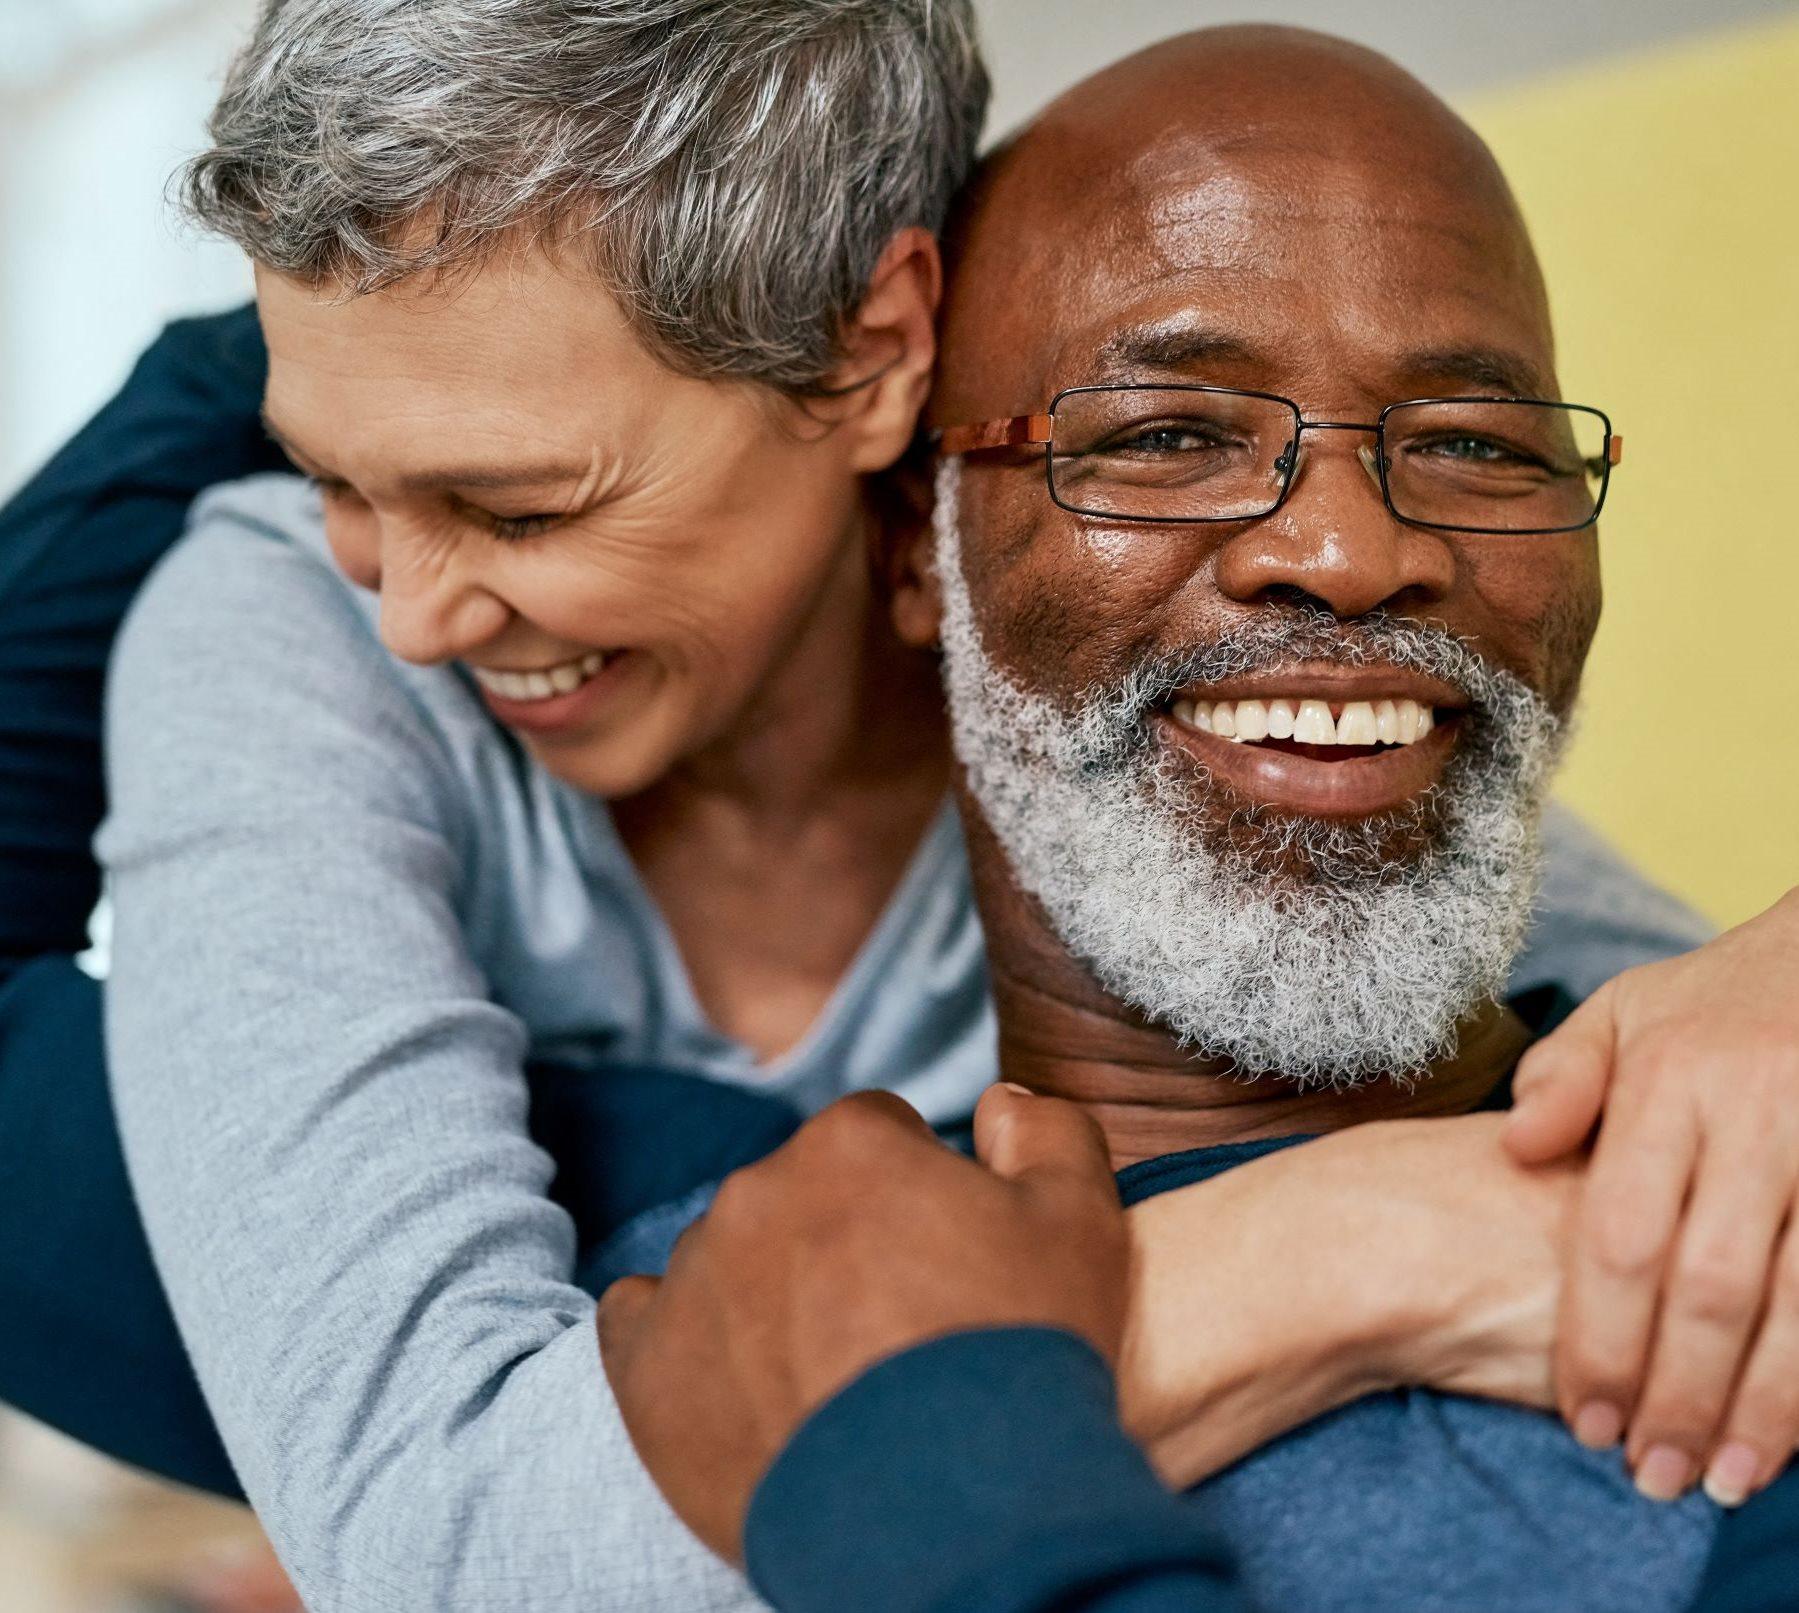 Elderly woman embracing an elderly man in a hug